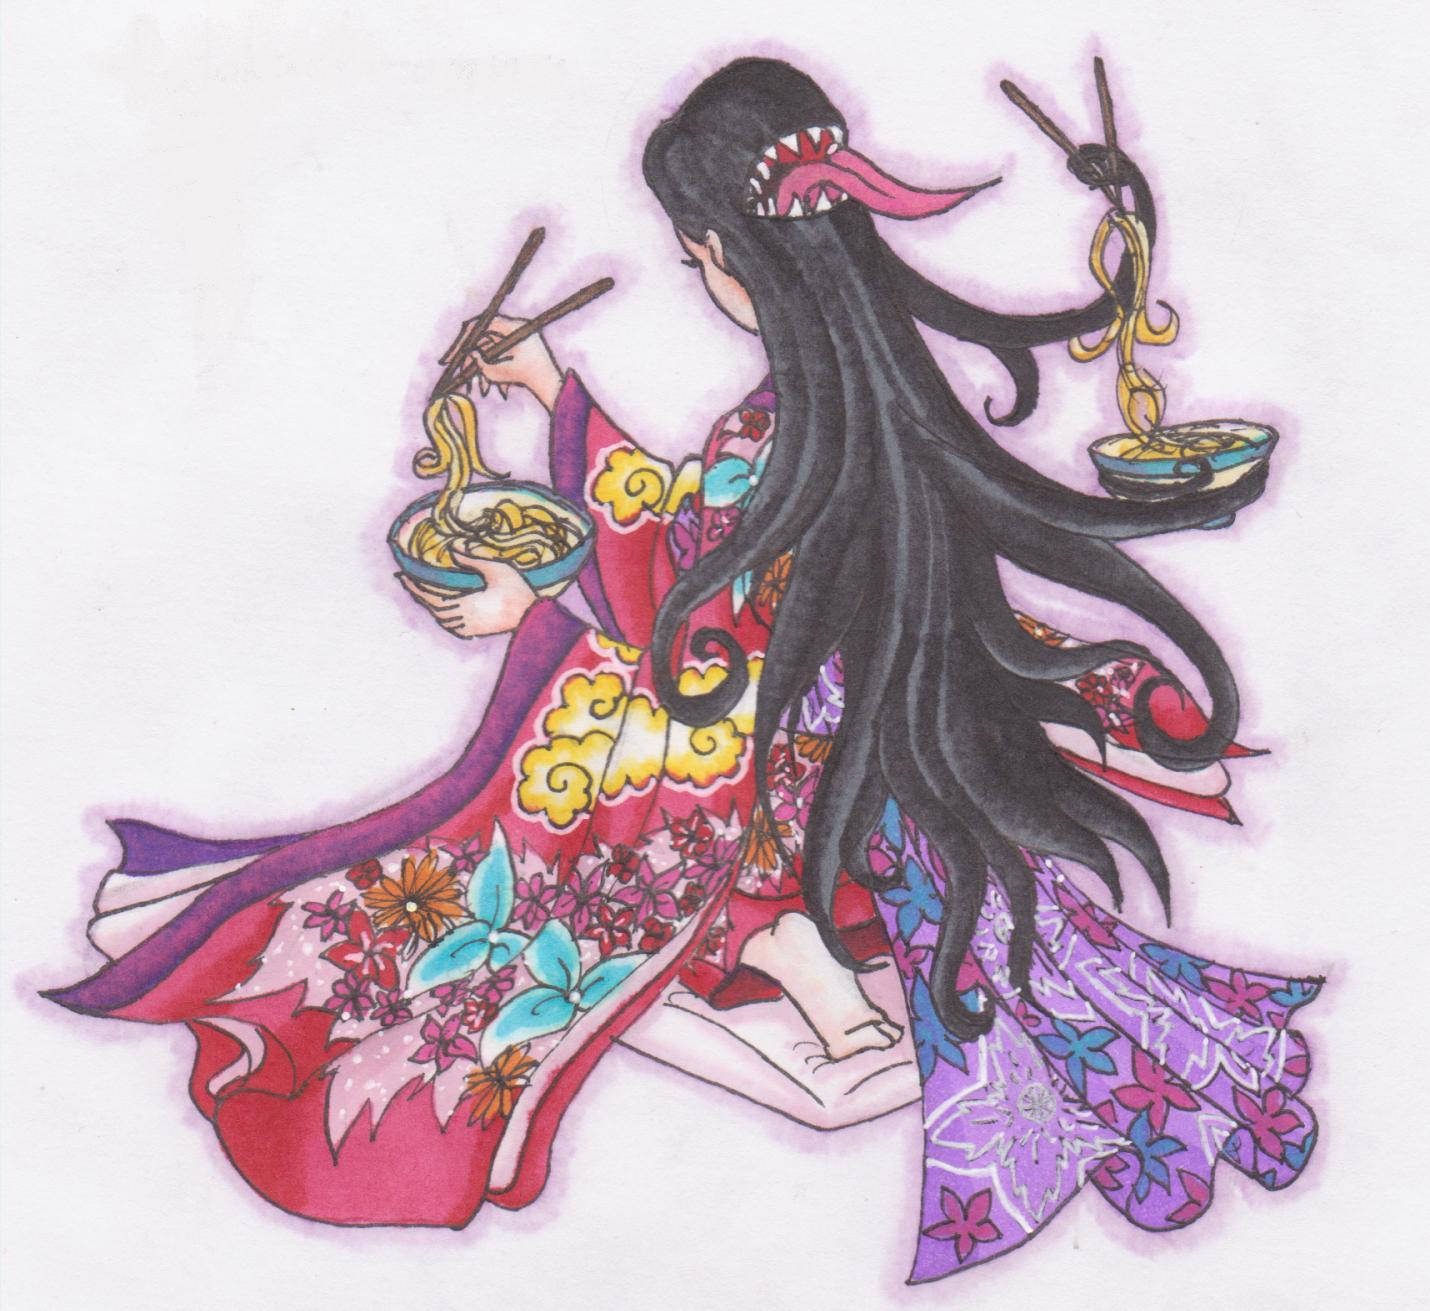 Gantz Yokai: Futakuchi-Onna By Ai-Don On DeviantArt